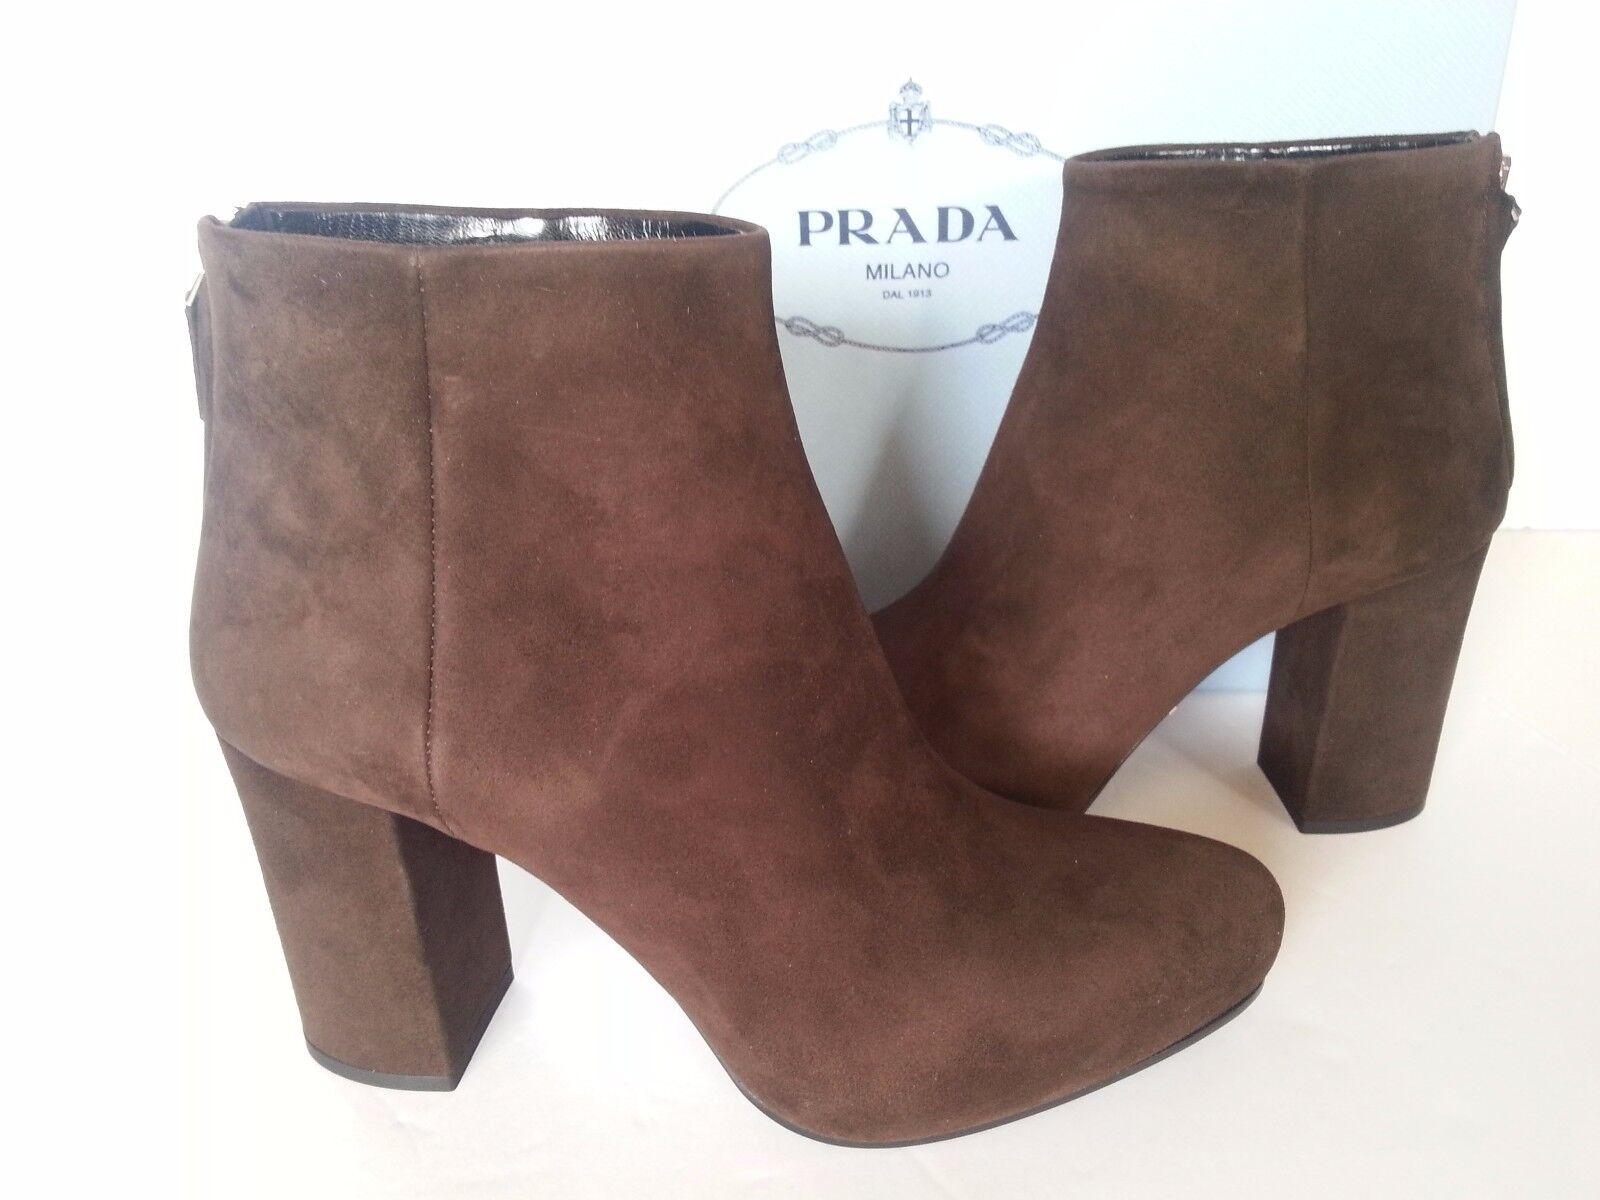 NEW NEW NEW PRADA Suede Platform Ankle démarrageies 85 mm Heels bottes marron 37   7 US f665c5